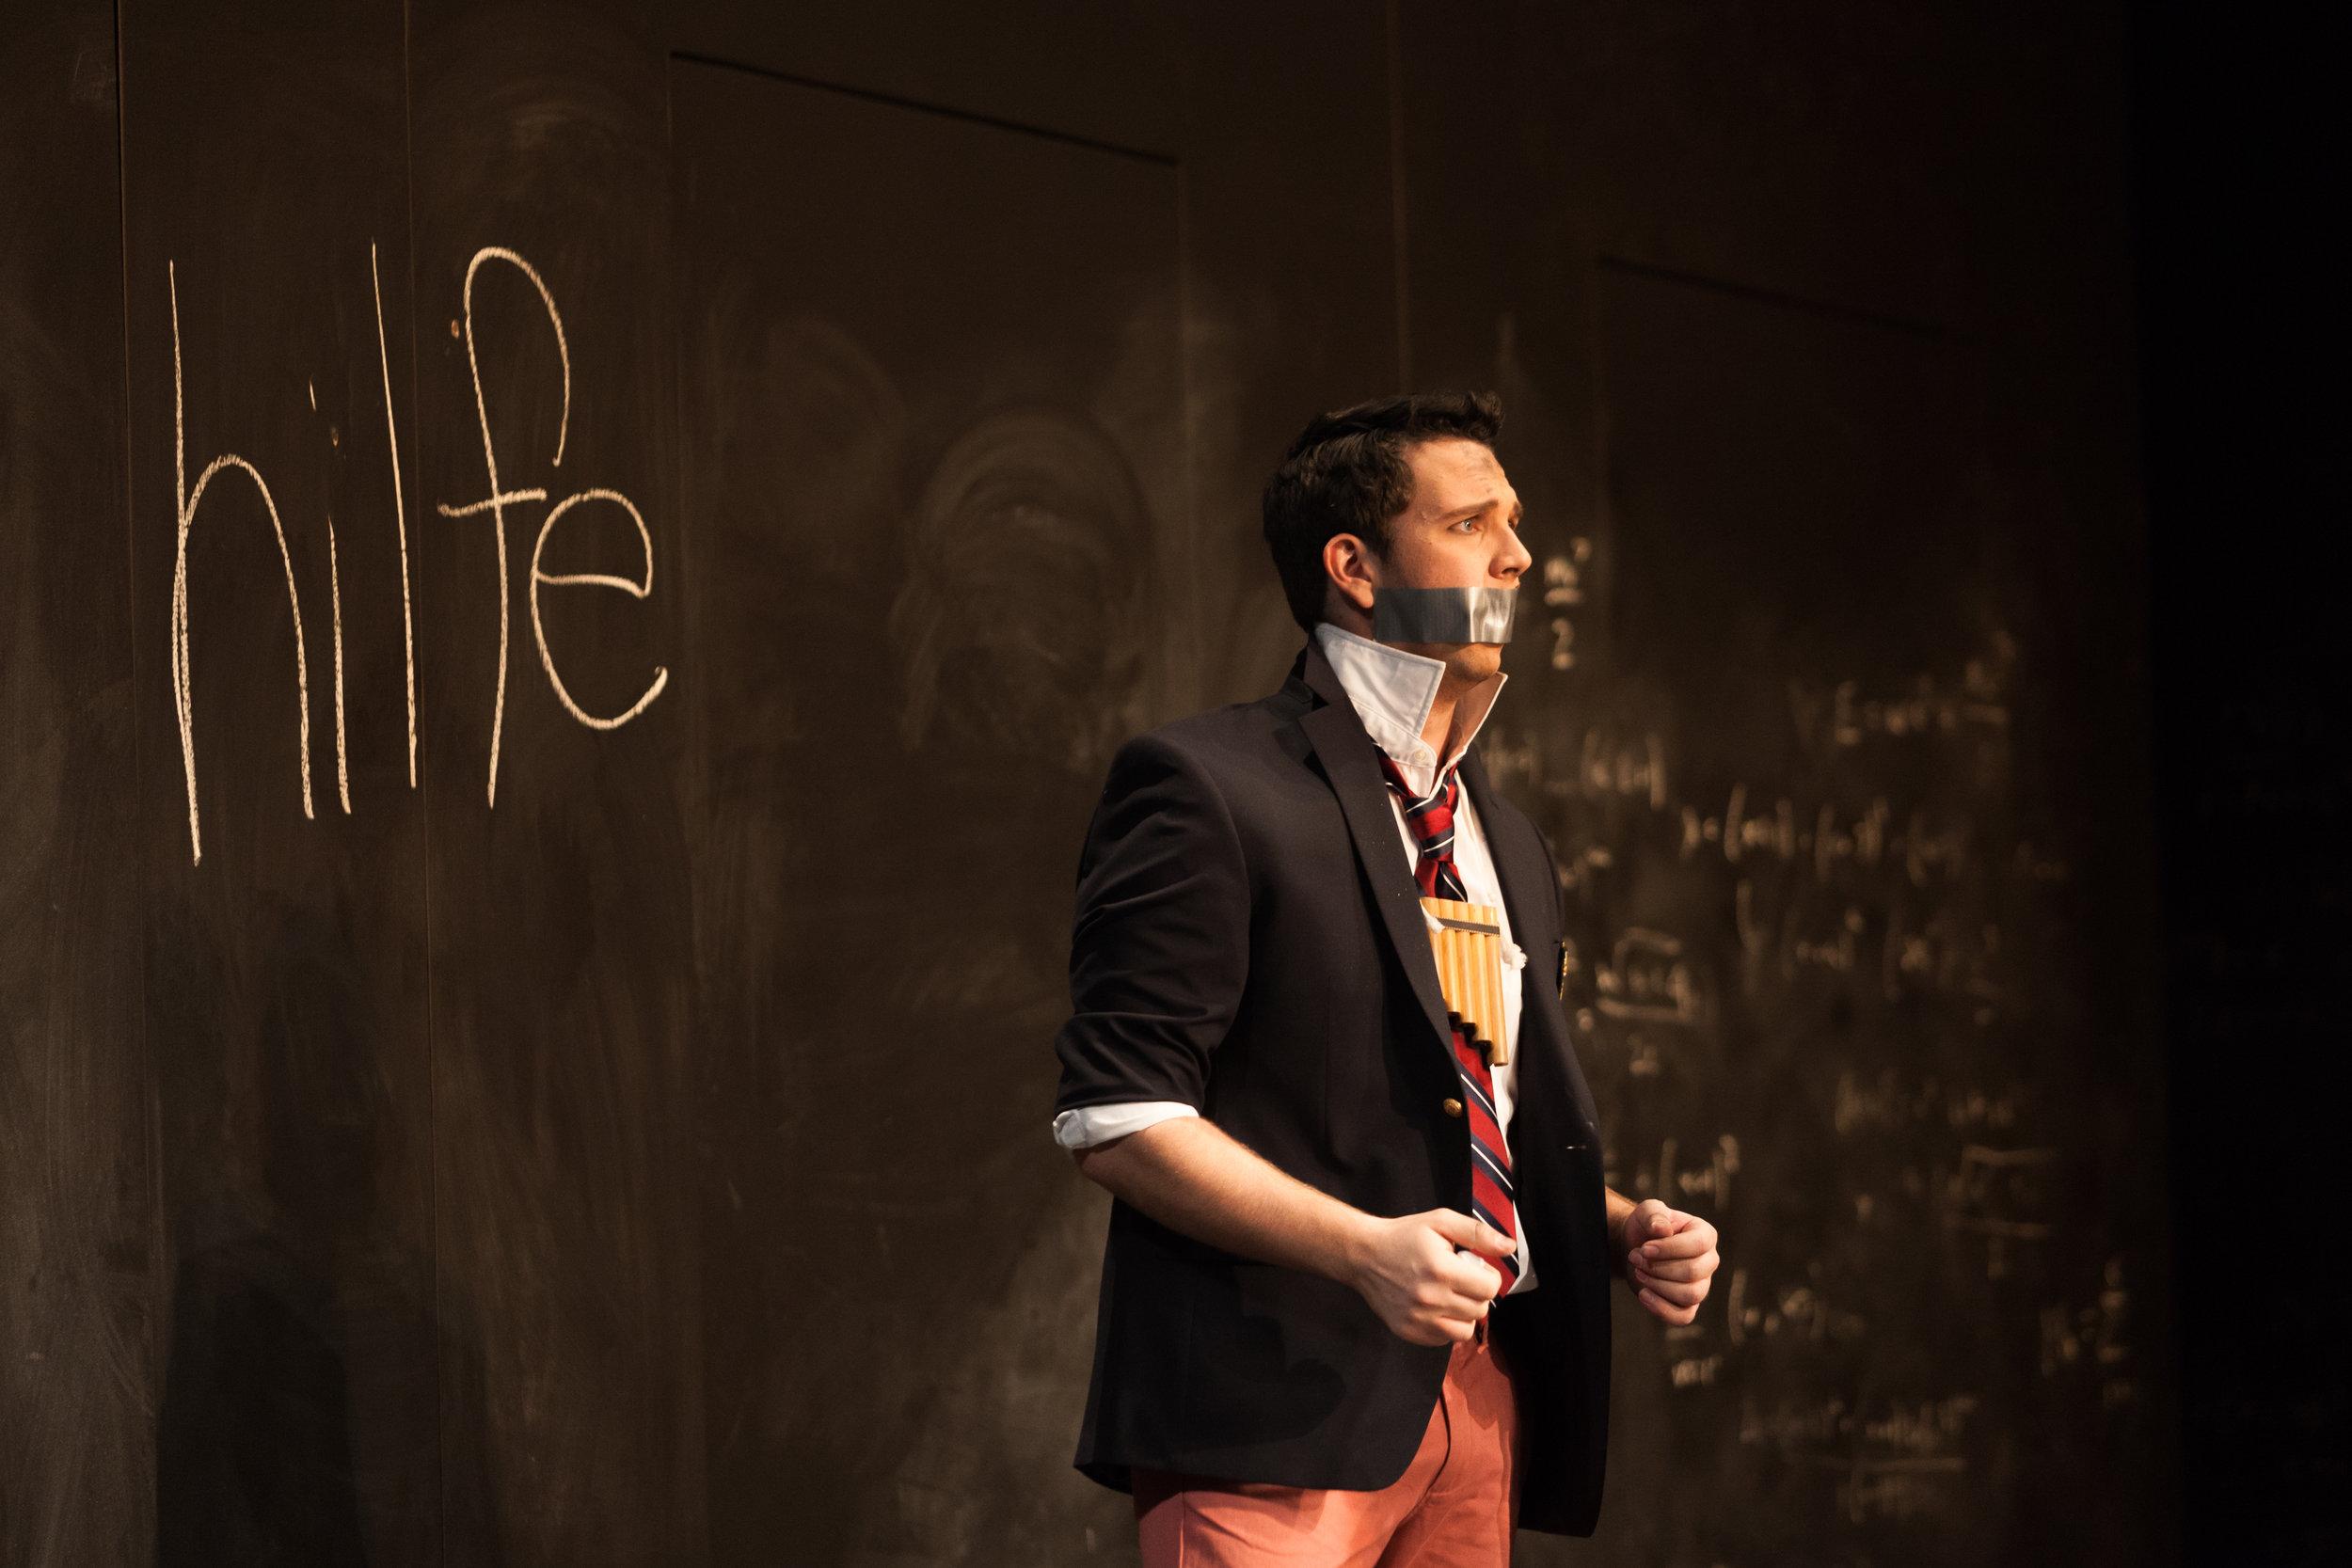 Curtis Opera Theatre: Papageno in Die Zauberflöte  Director:Chas Rader-Shieber  Conductor:Vinay Parameswaran  Photo: Karli Cadel